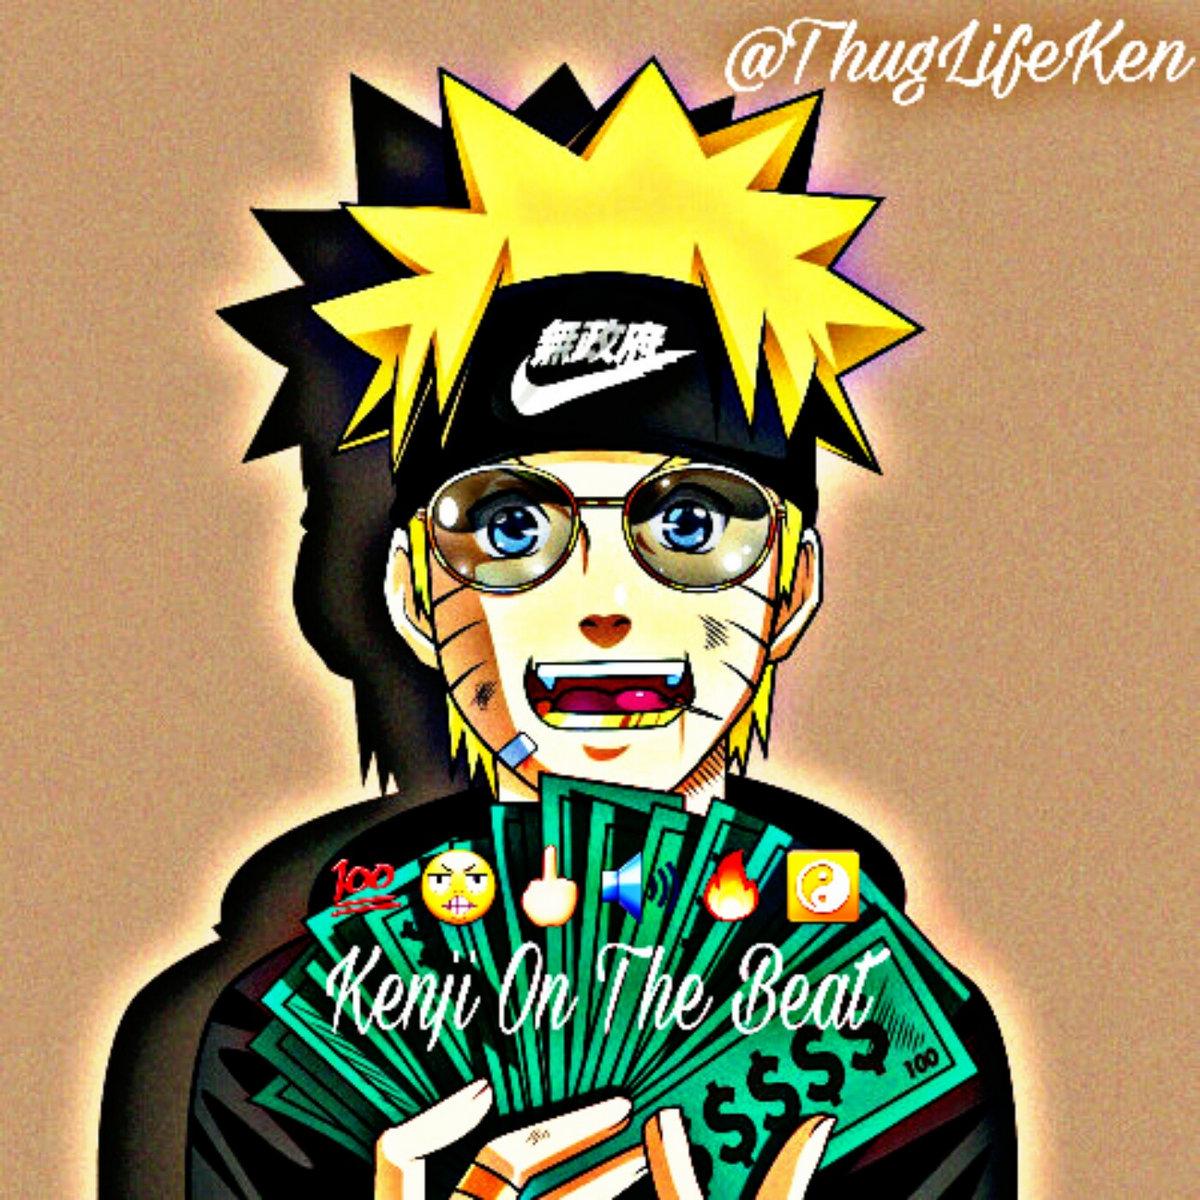 Naruto Shippuden Trap Theme Song Remix | Kenji On The Beat